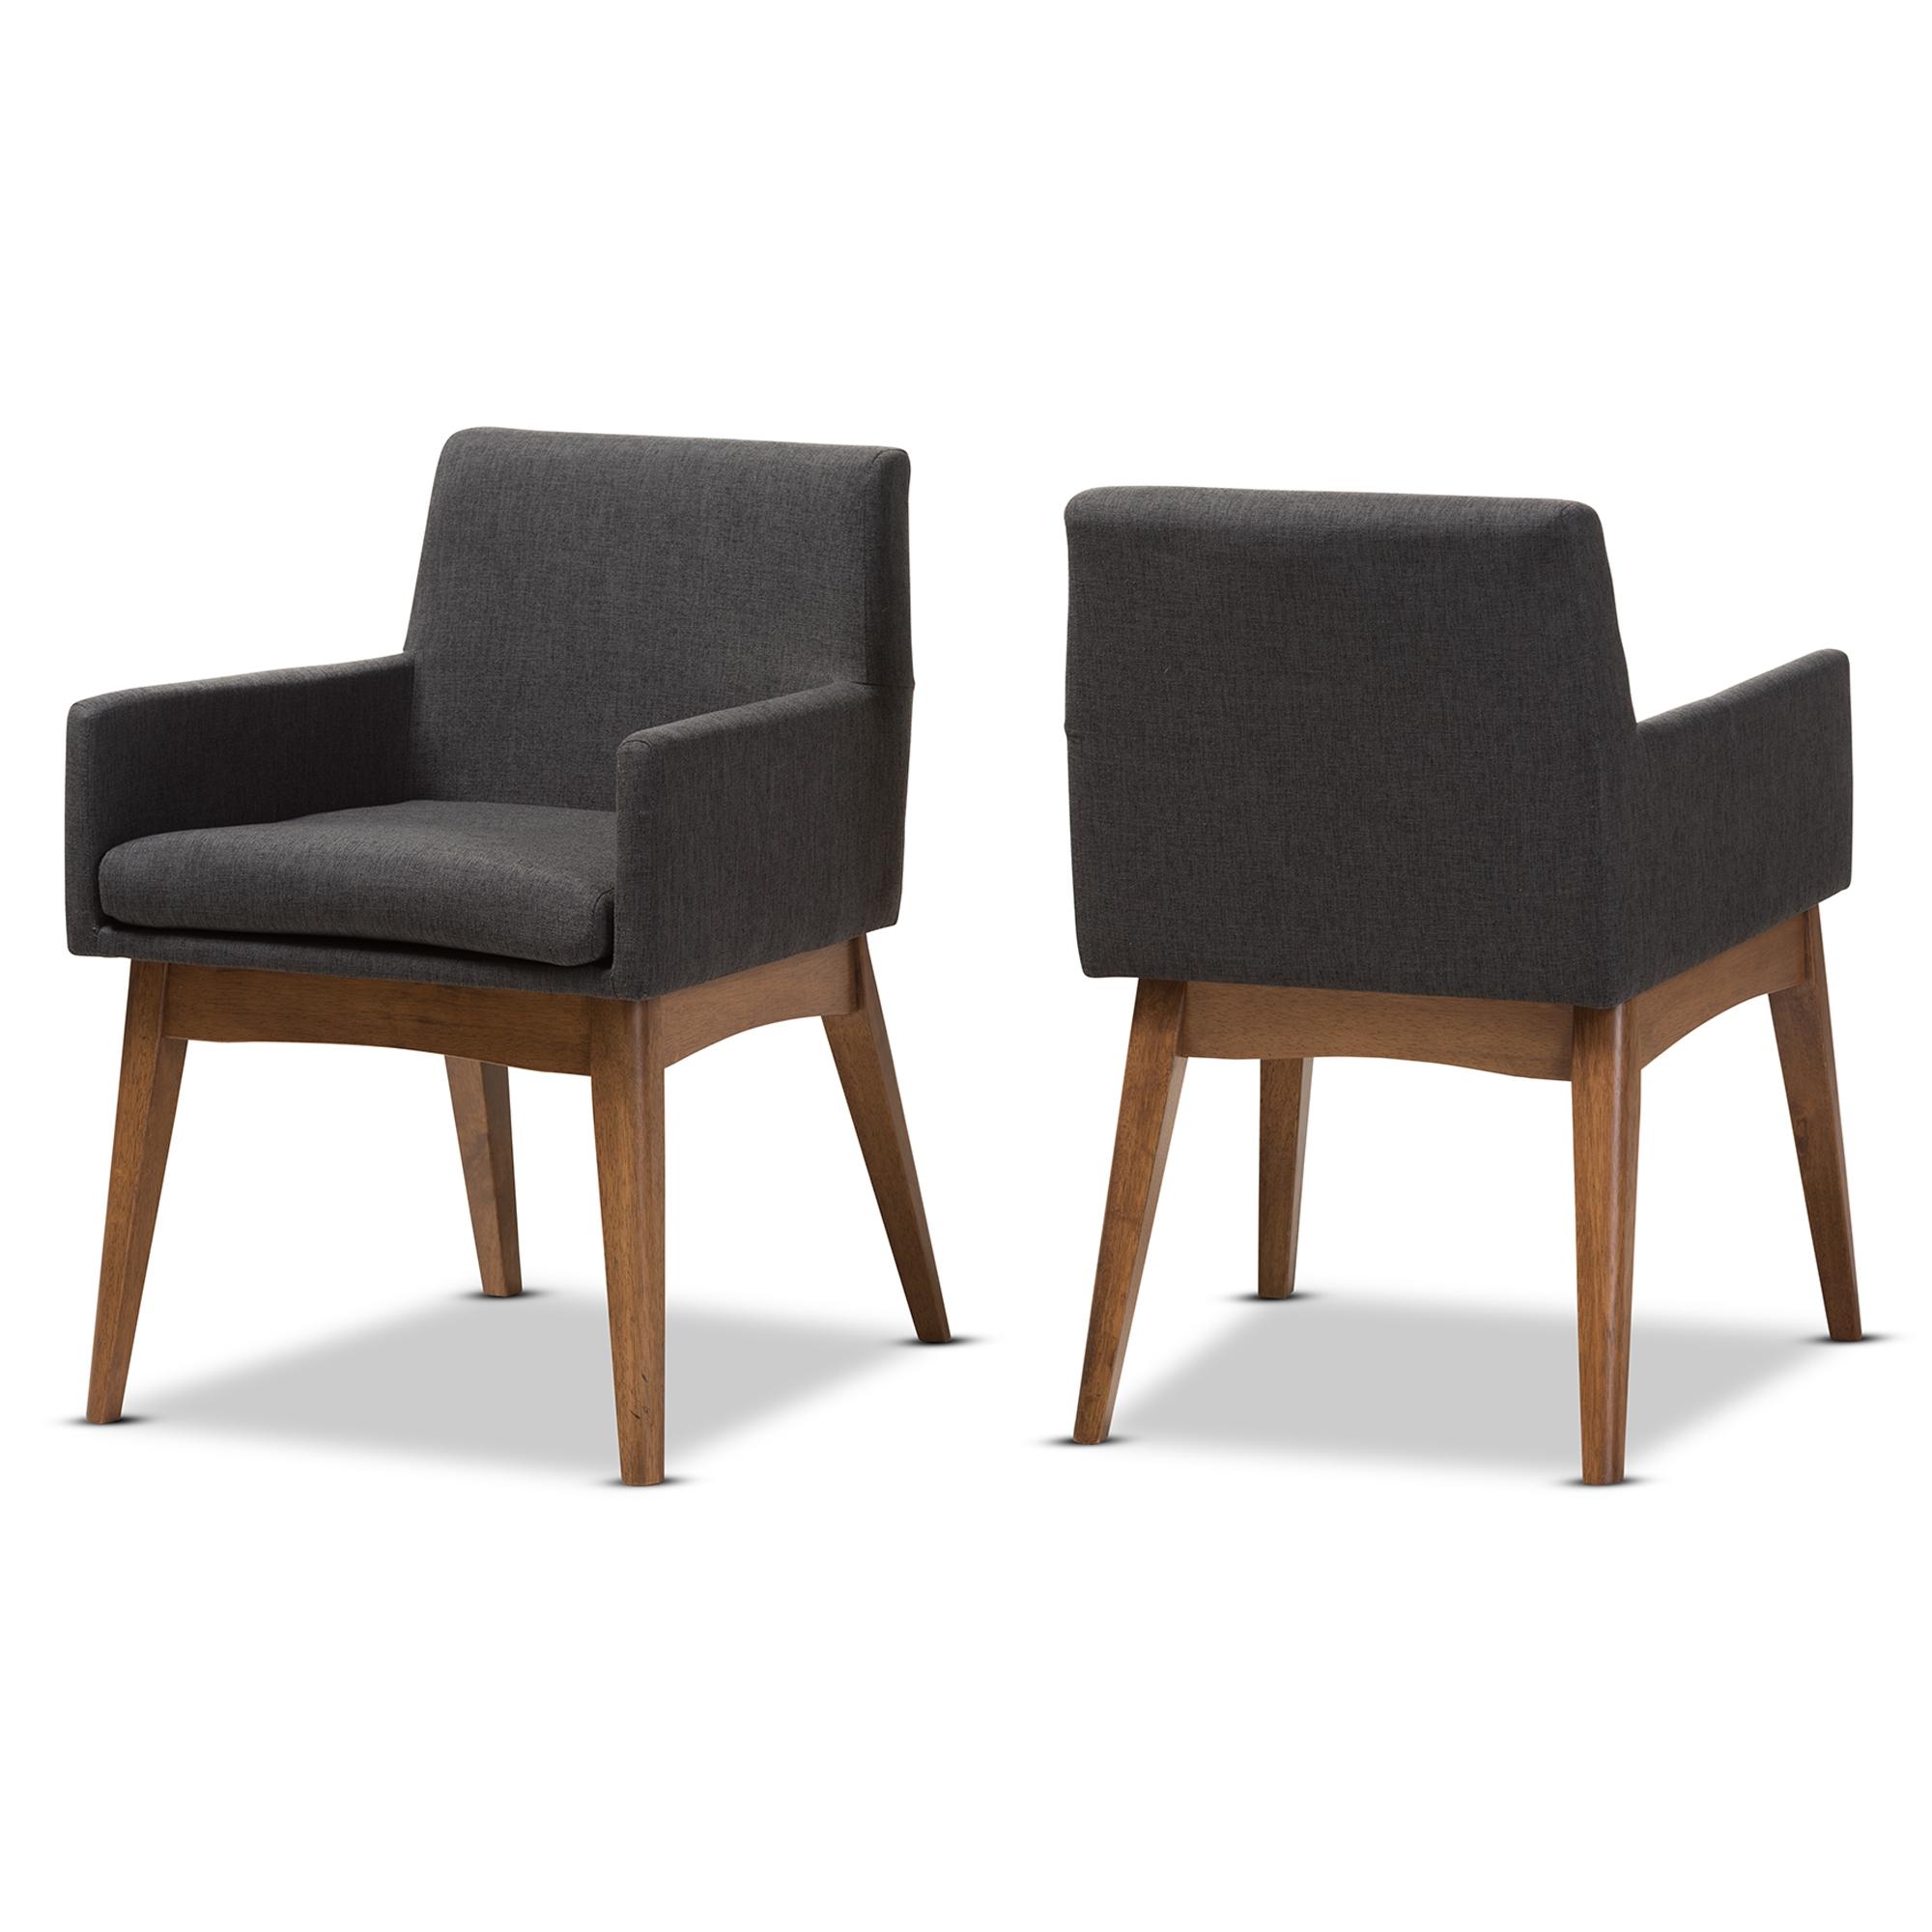 Baxton Studio Nexus Mid Century Modern Walnut Wood Finishing Dark Grey  Fabric Dining Armchair Affordable